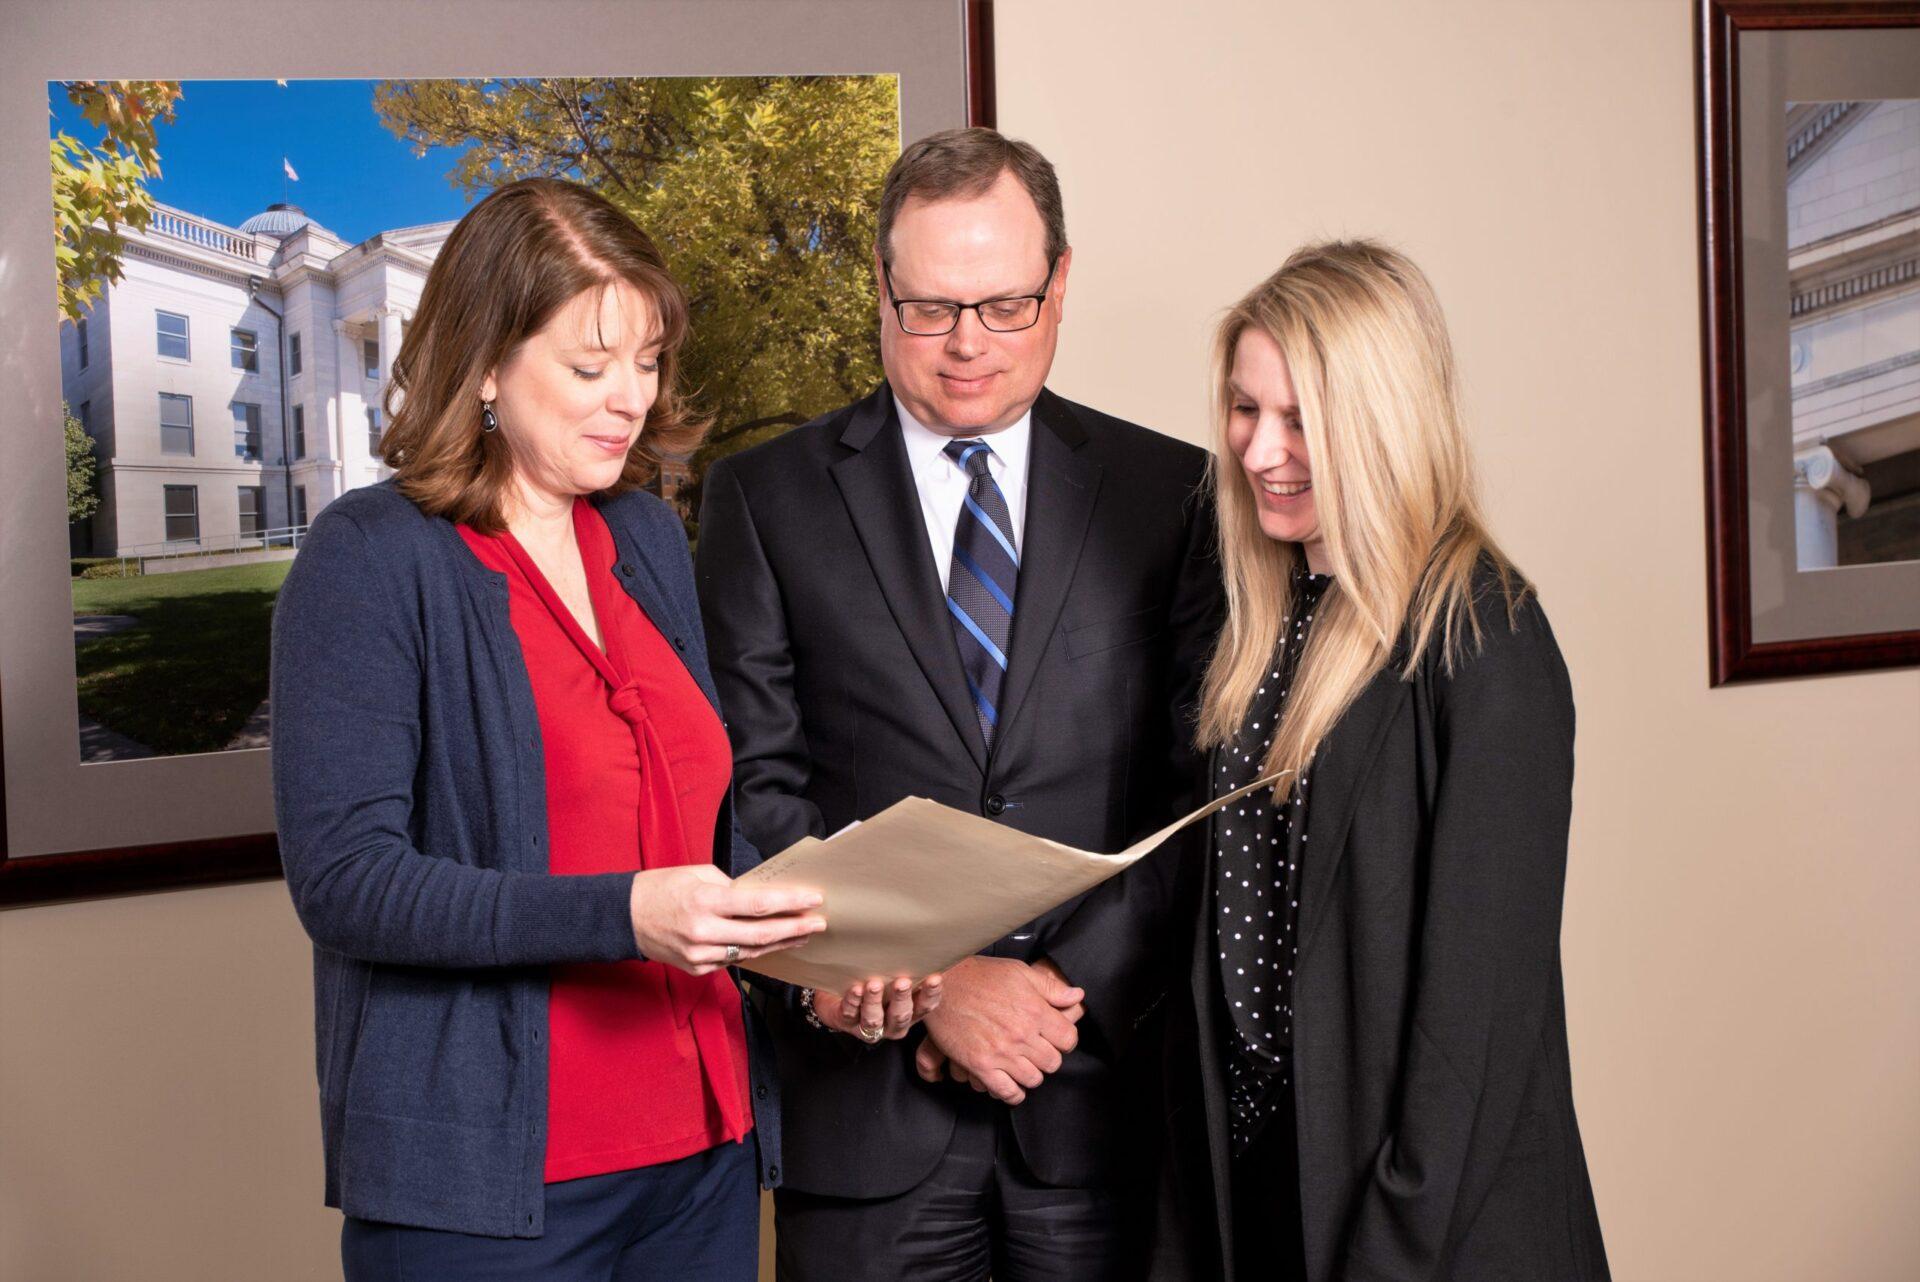 Casey Elliot, Karen Hajicek, and Thomas Harrison looking over legal documents